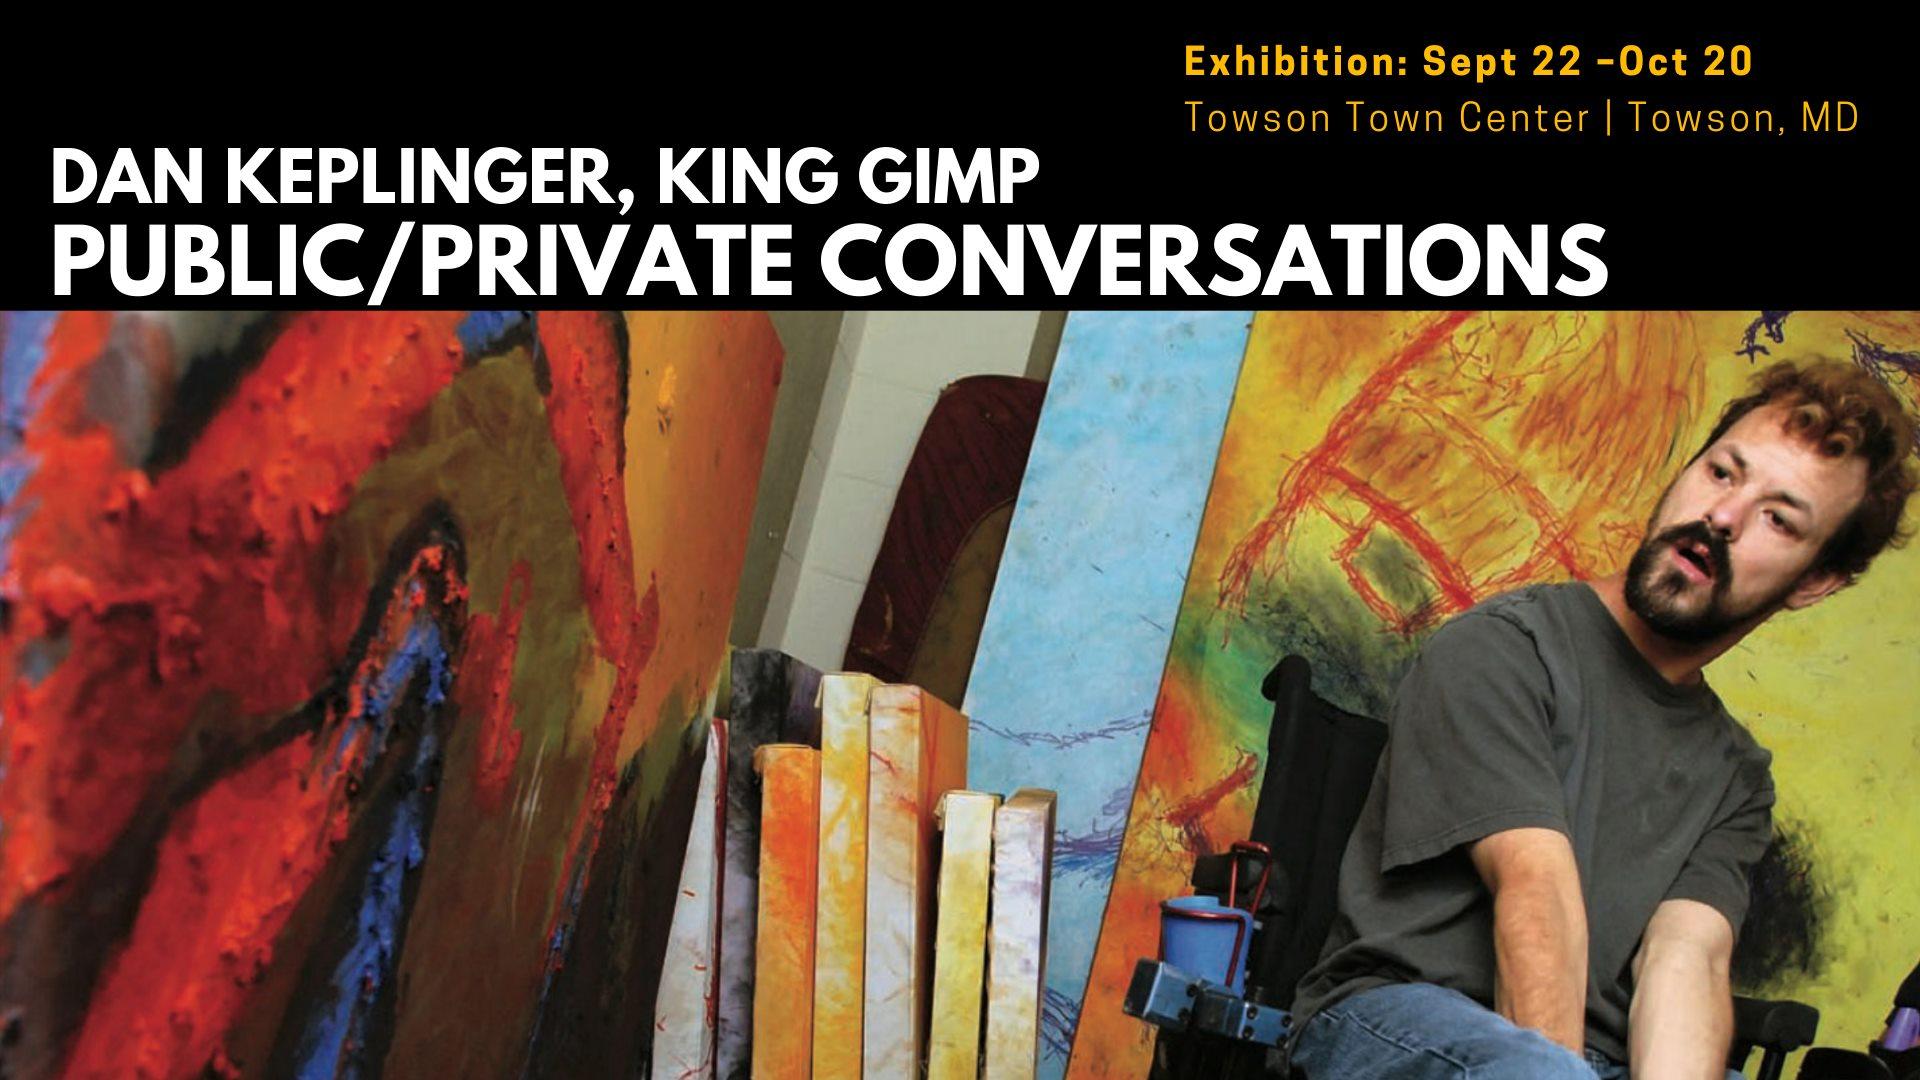 Dan Keplinger Art Exhibit